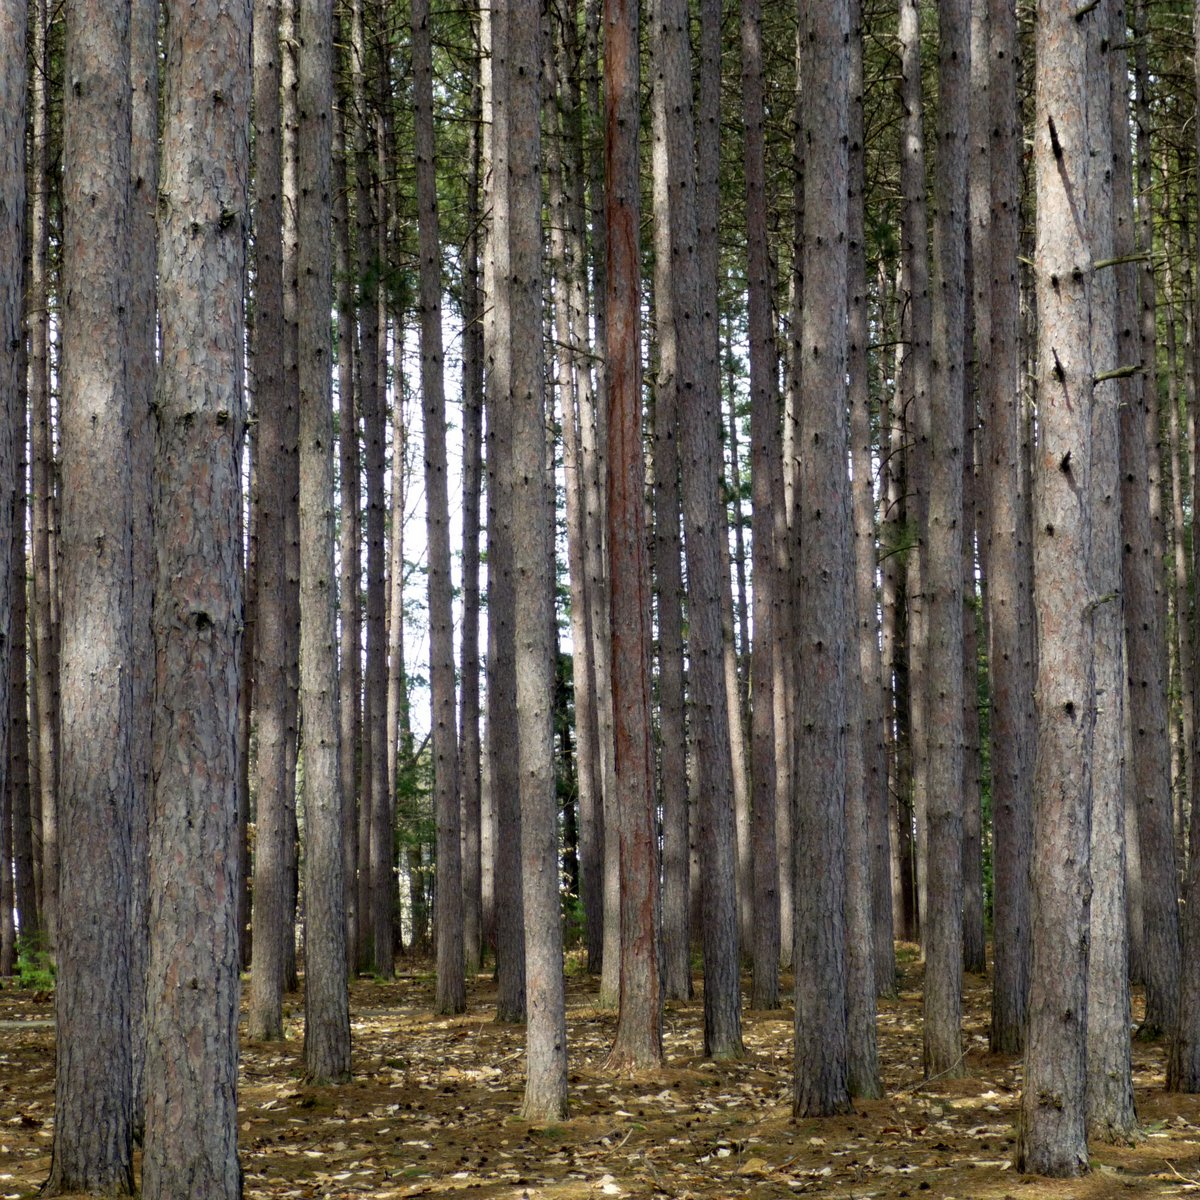 1. Pines